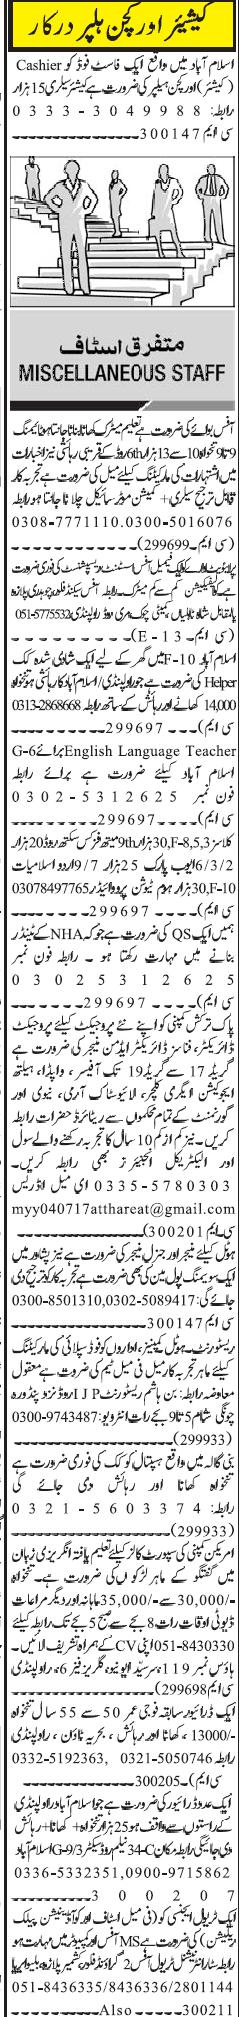 Office Management Jobs 2019 in Rawalpindi